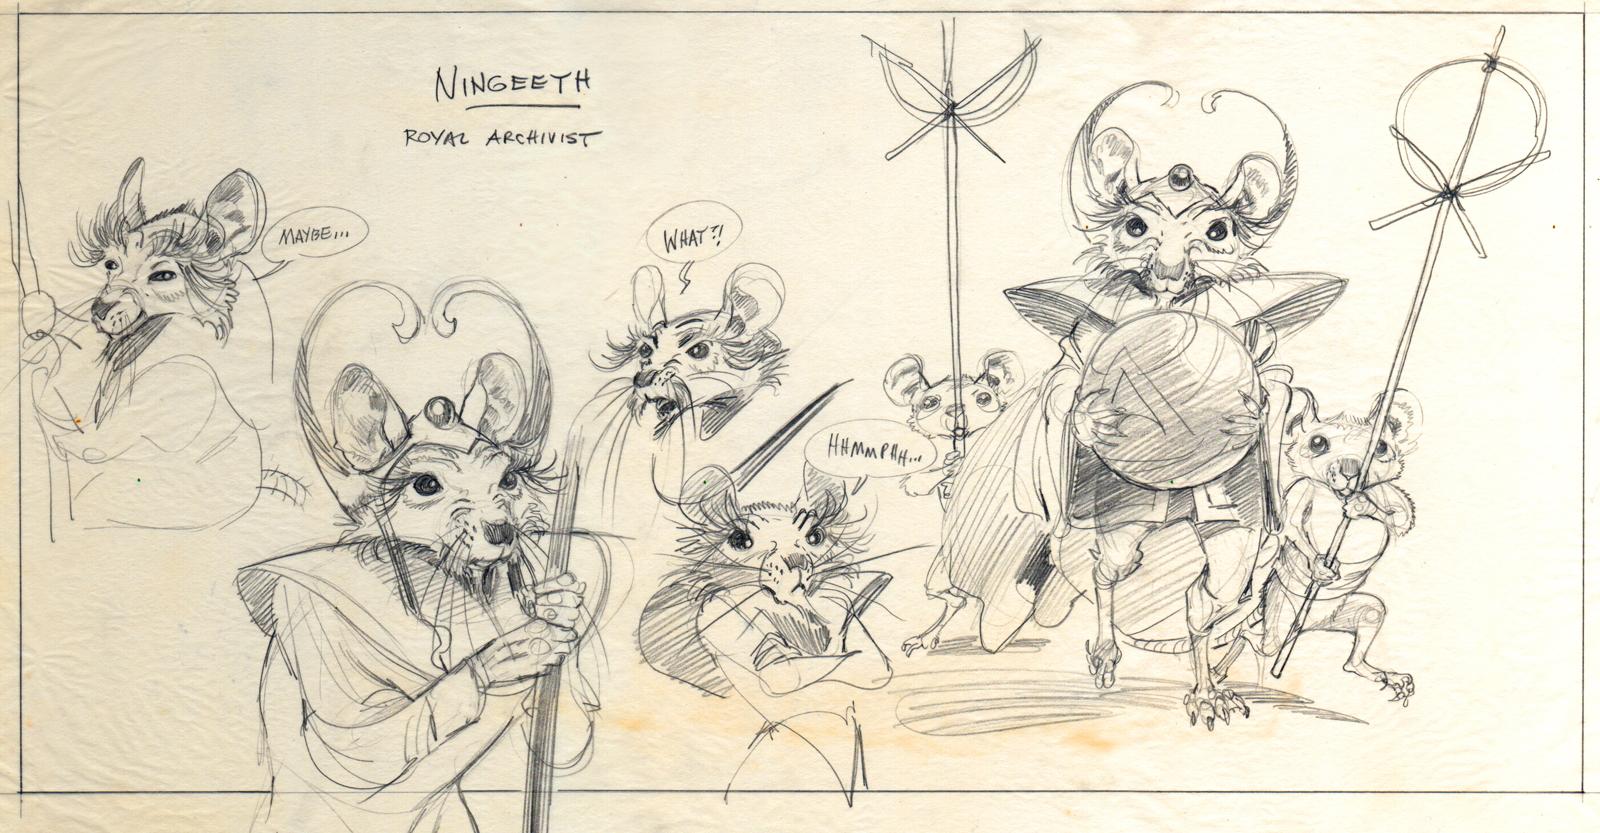 NS Ningeeth design